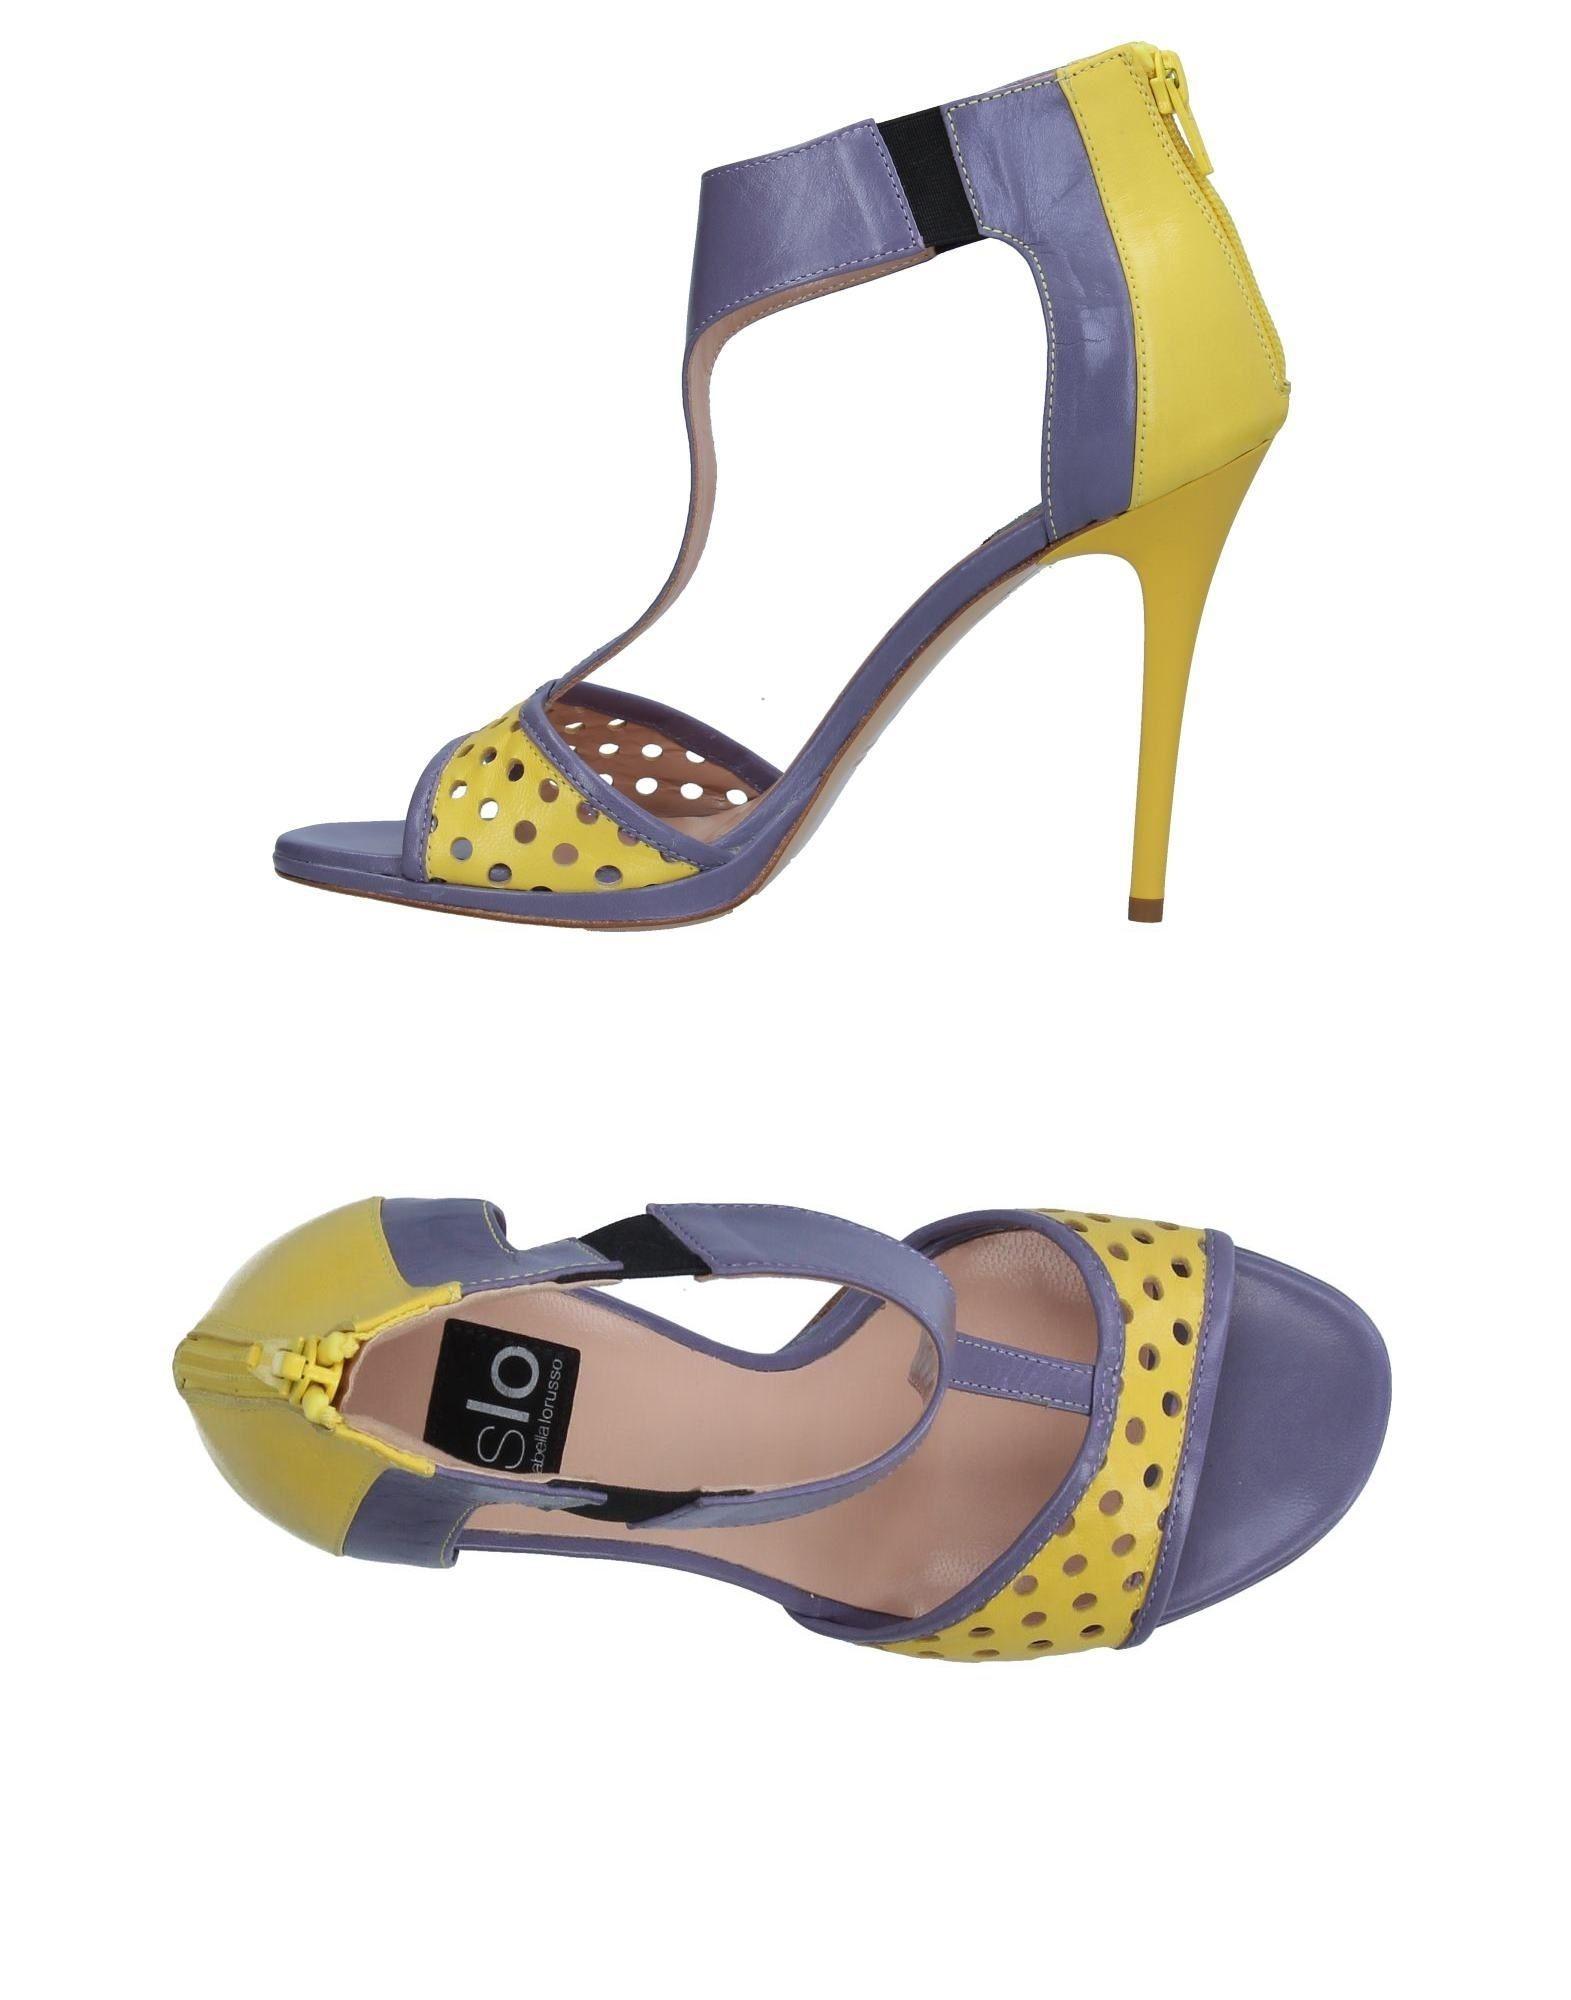 Islo Isabella Lorusso Sandales Femme. MEPHISTO LUISA - Baskets basses / Baskets mode - Noir - Femme - T. 35.5  Rouge) adidas NMD_r1 kqO8HLzD0m